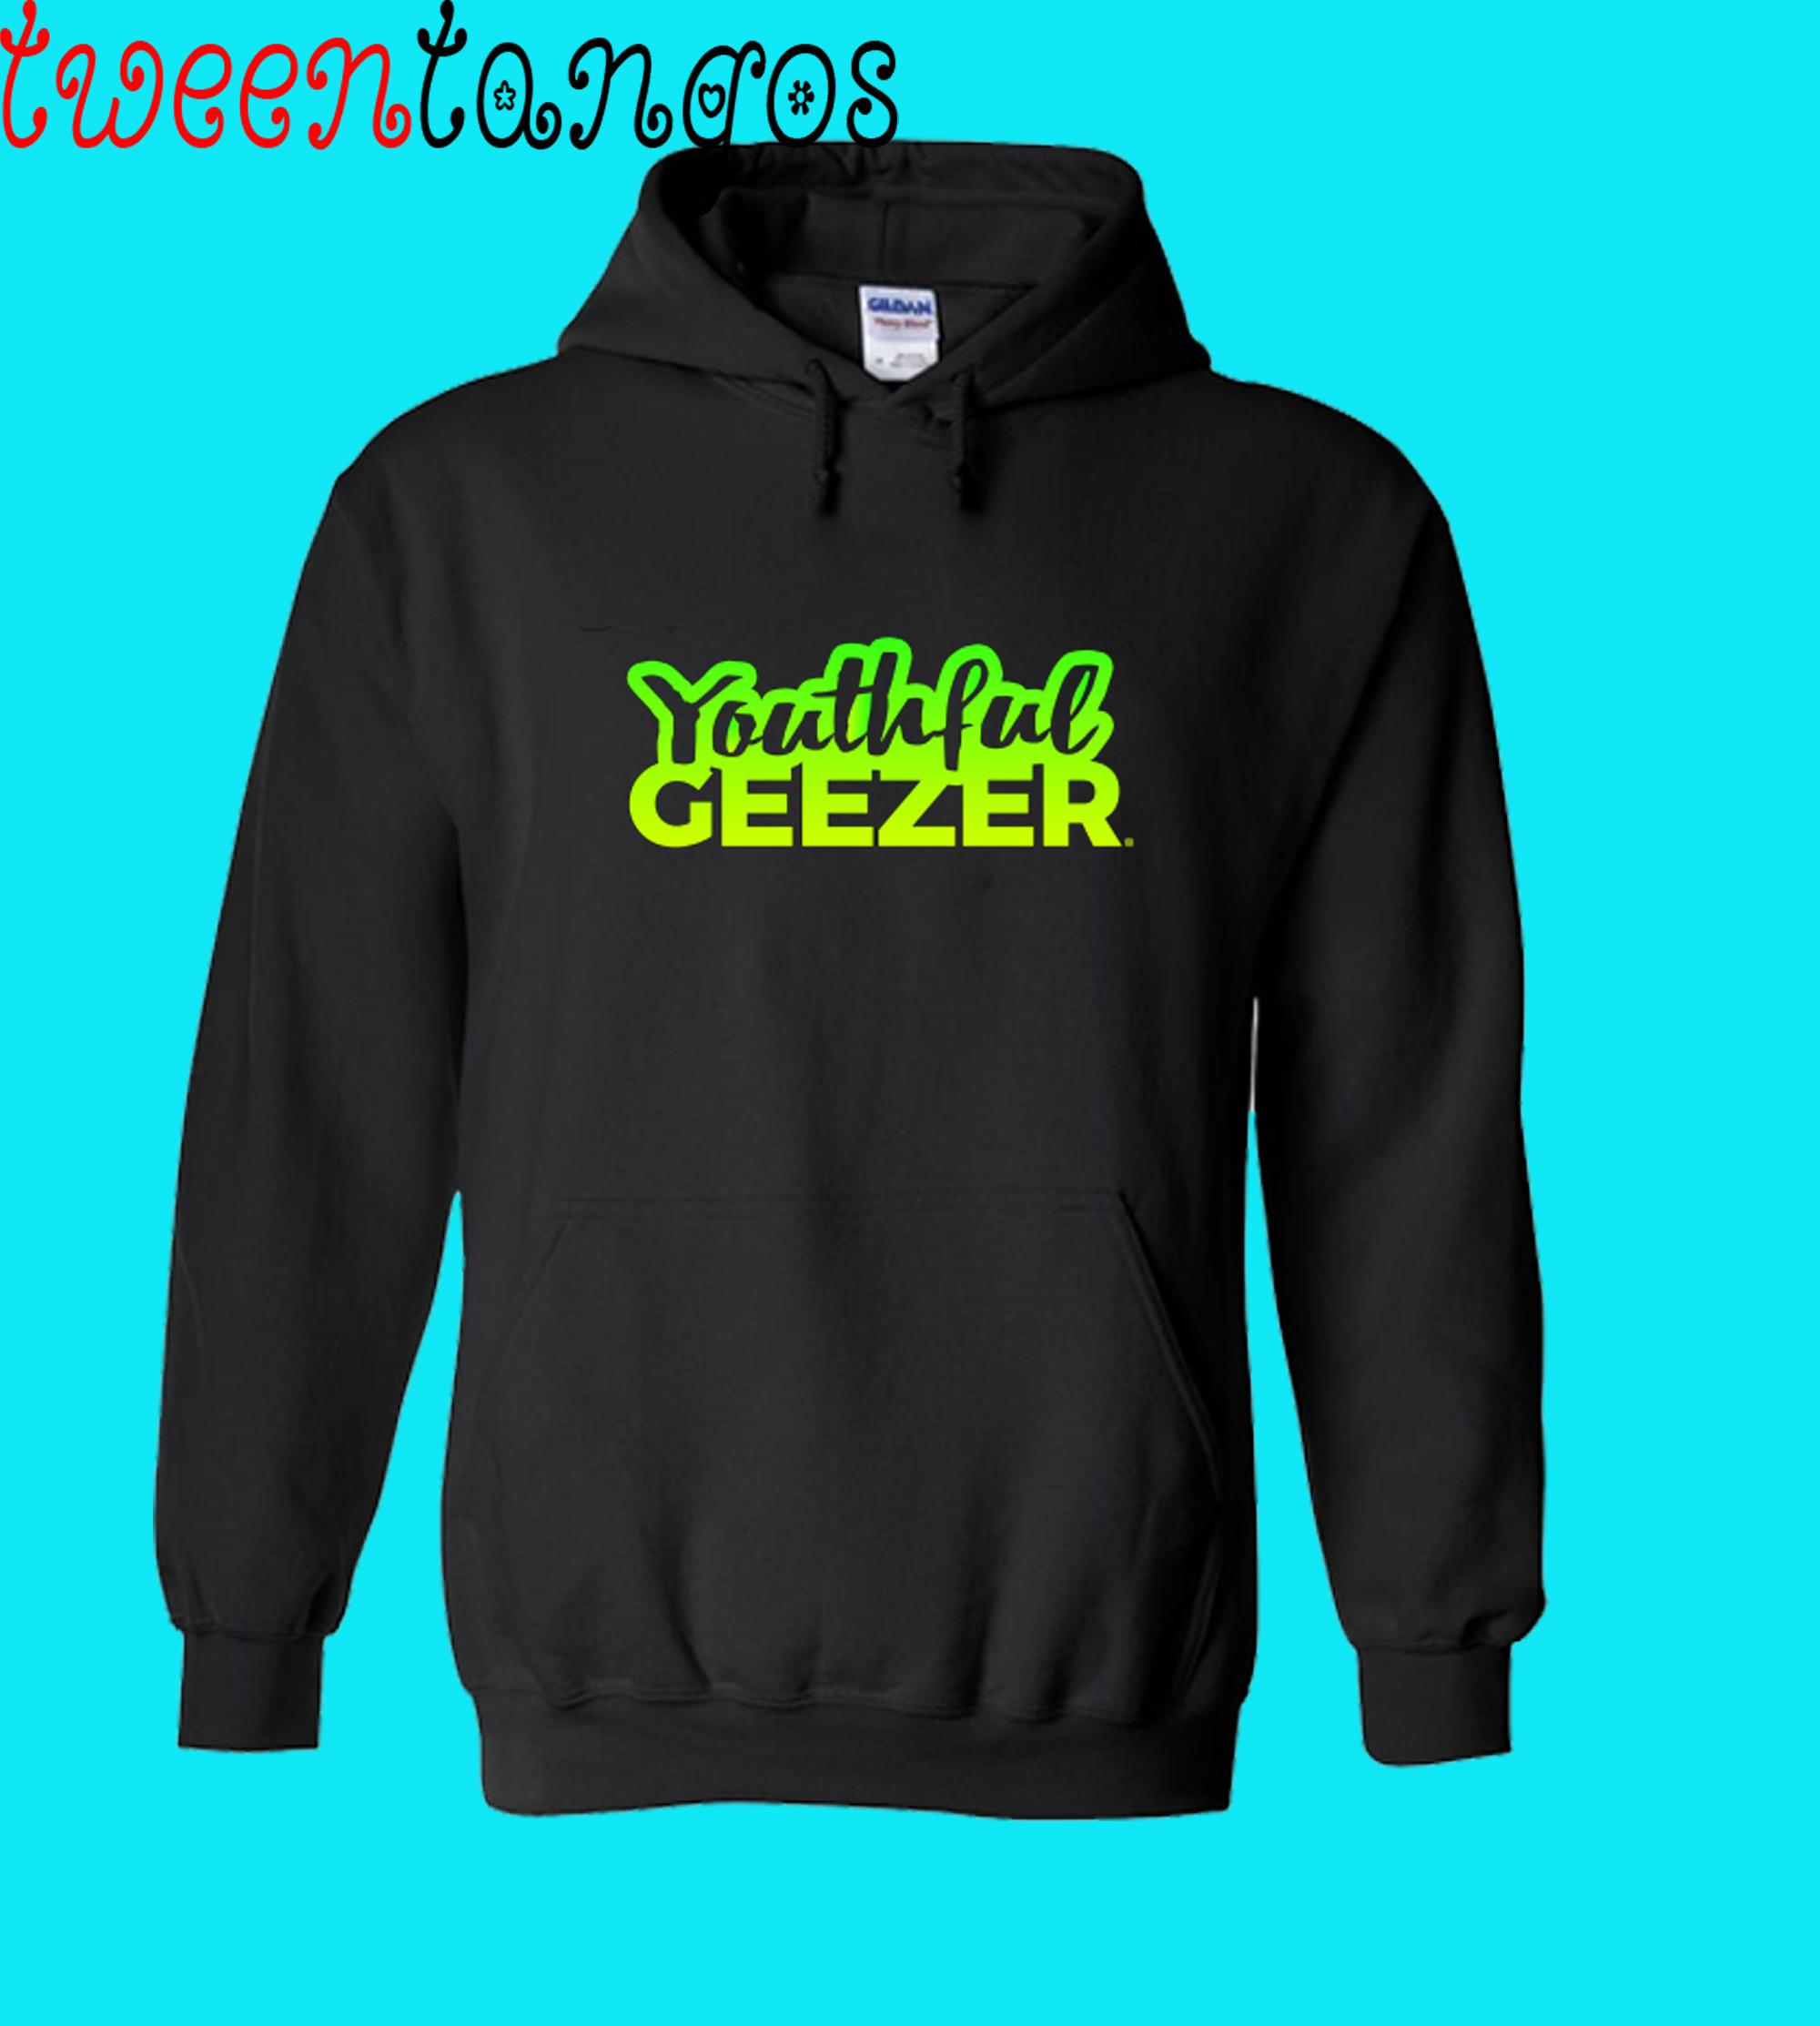 Youthful Geezer Brand Logo Bright Green,Yellow Hoodie